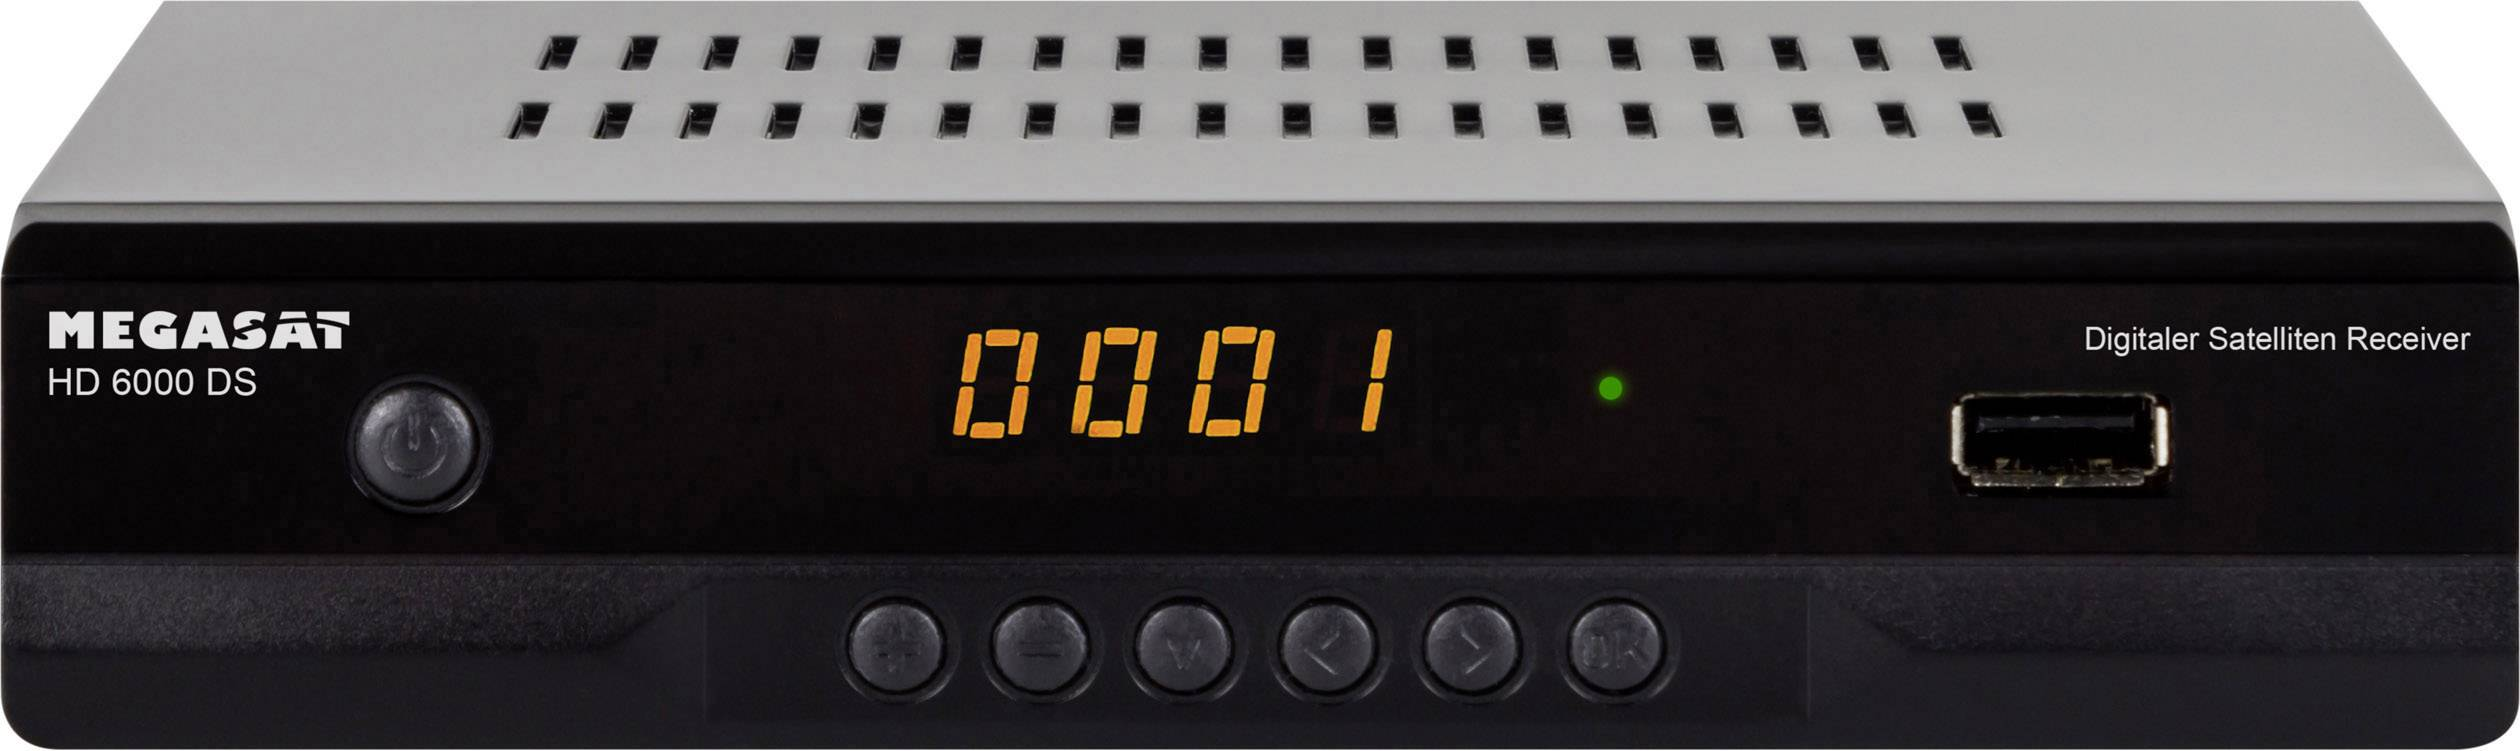 MegaSat HD 6000 DS Ricevitore